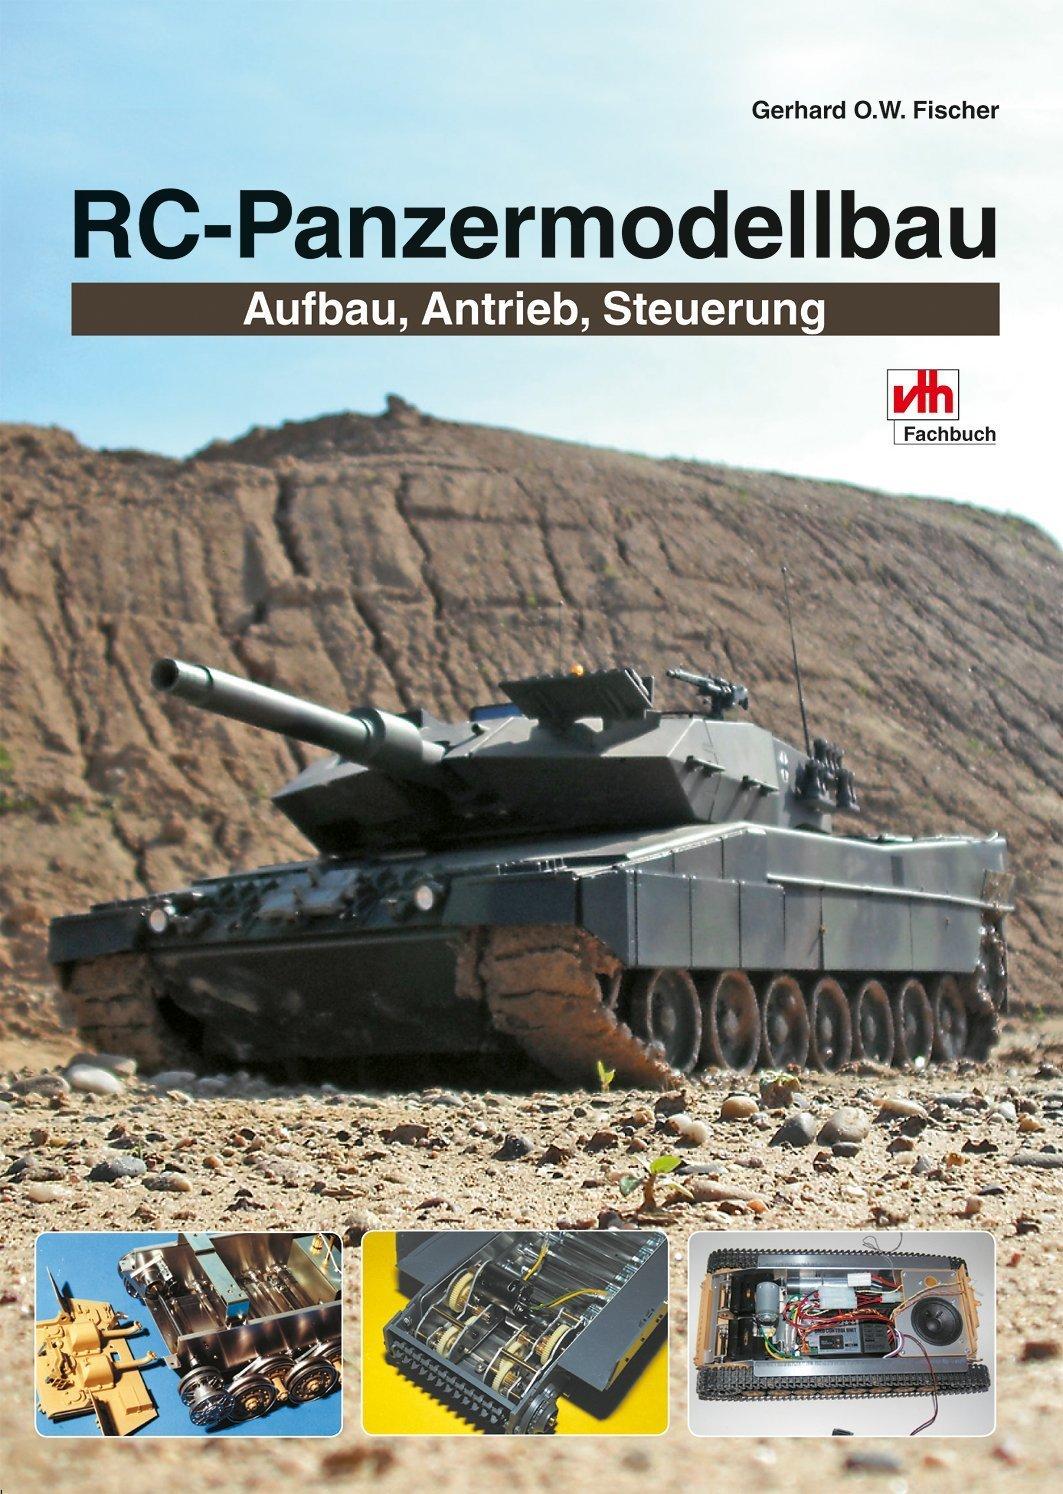 RC-Panzermodellbau - Aufbau, Antrieb, Steuerung